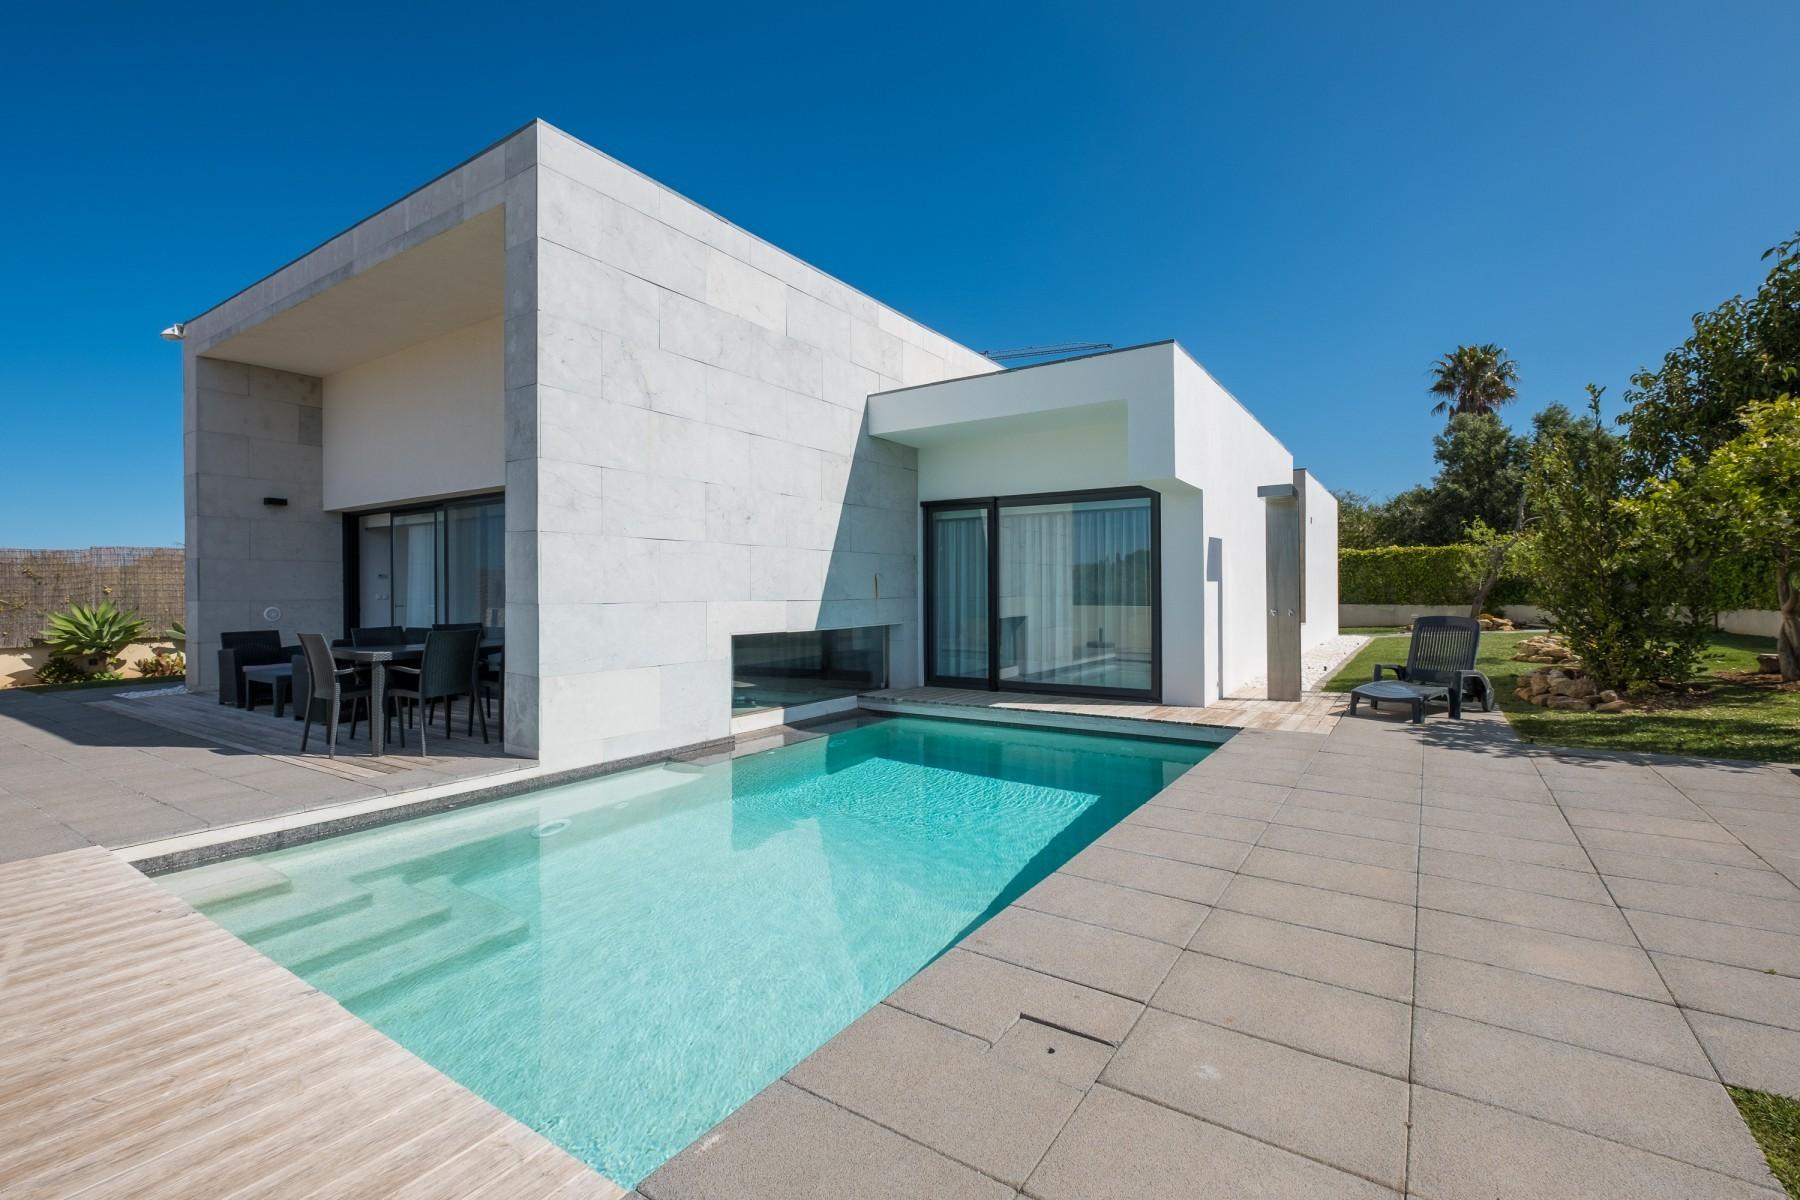 Villa/Dettached house in Luz - Villa with free Wi-Fi   A/C   private pool   garden   tennis court   near beach   sea view [RLUZ17]